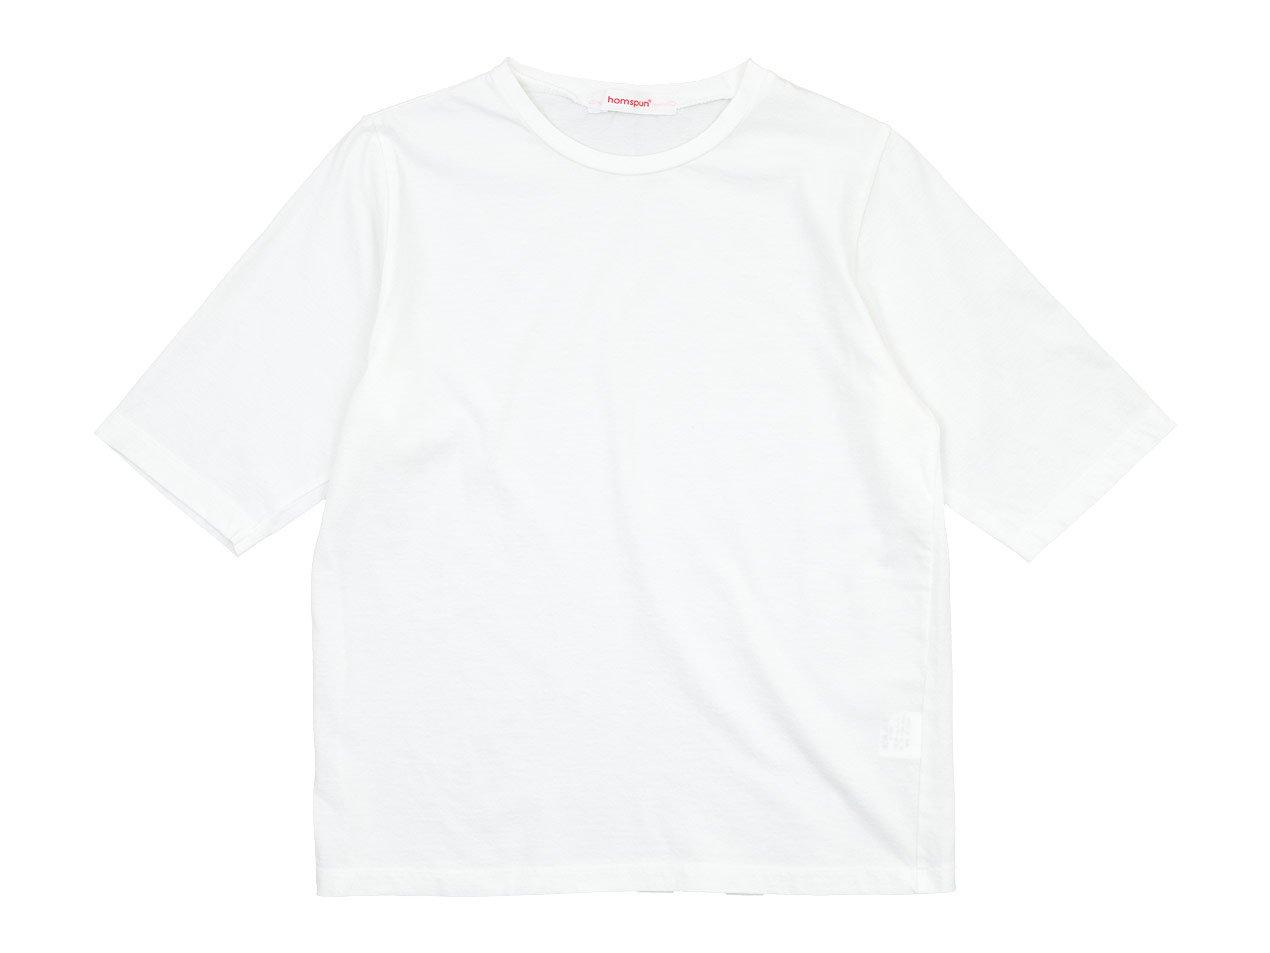 homspun 30/1天竺 五分袖Tシャツ サラシ